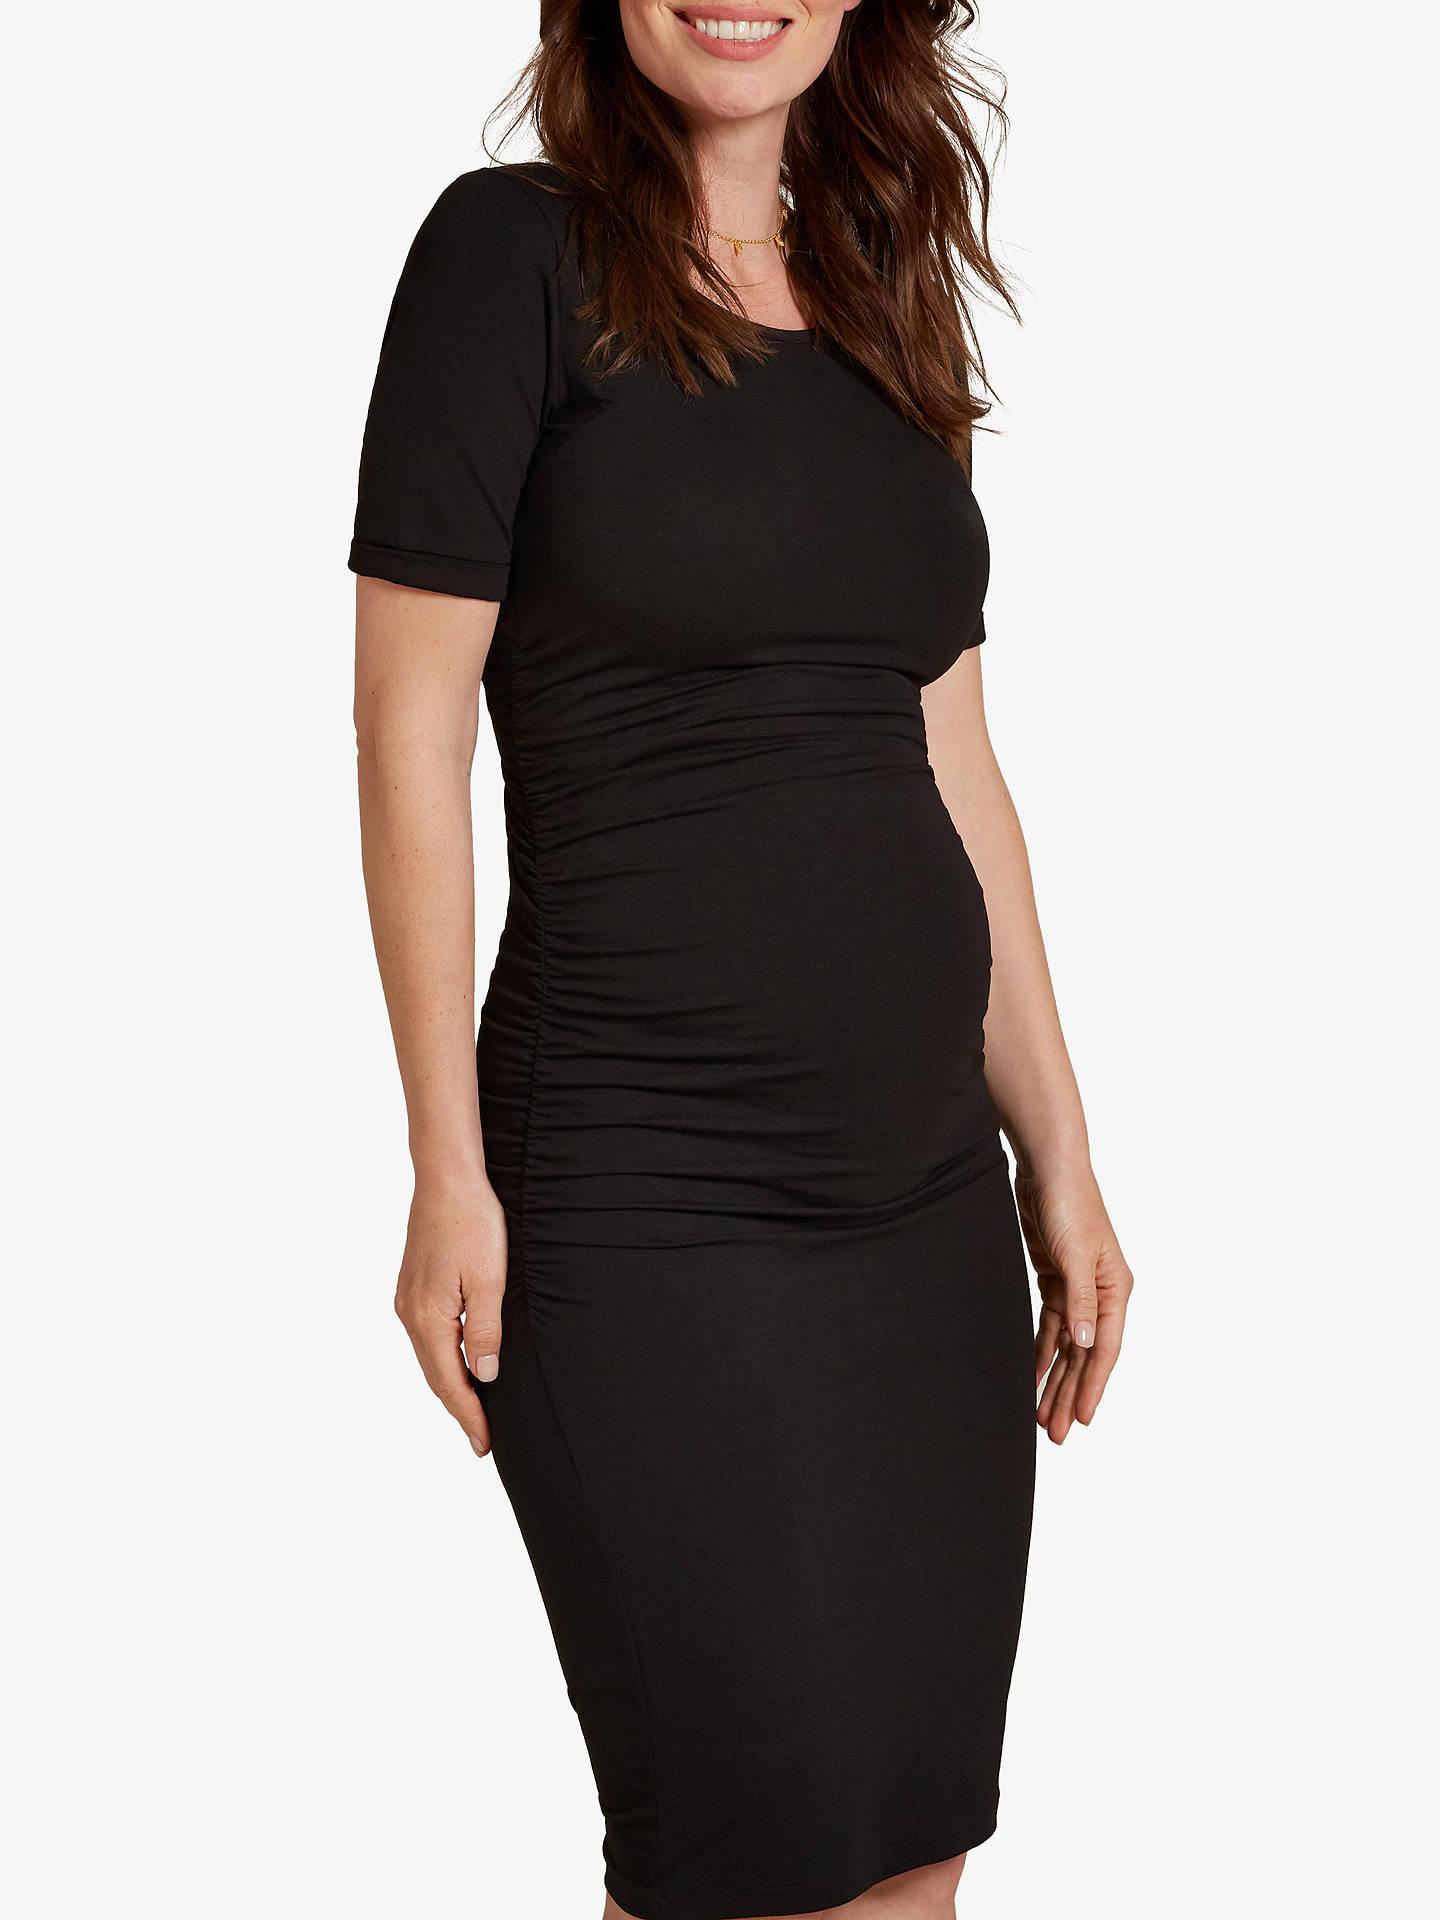 Ruched T-Shirt Dress